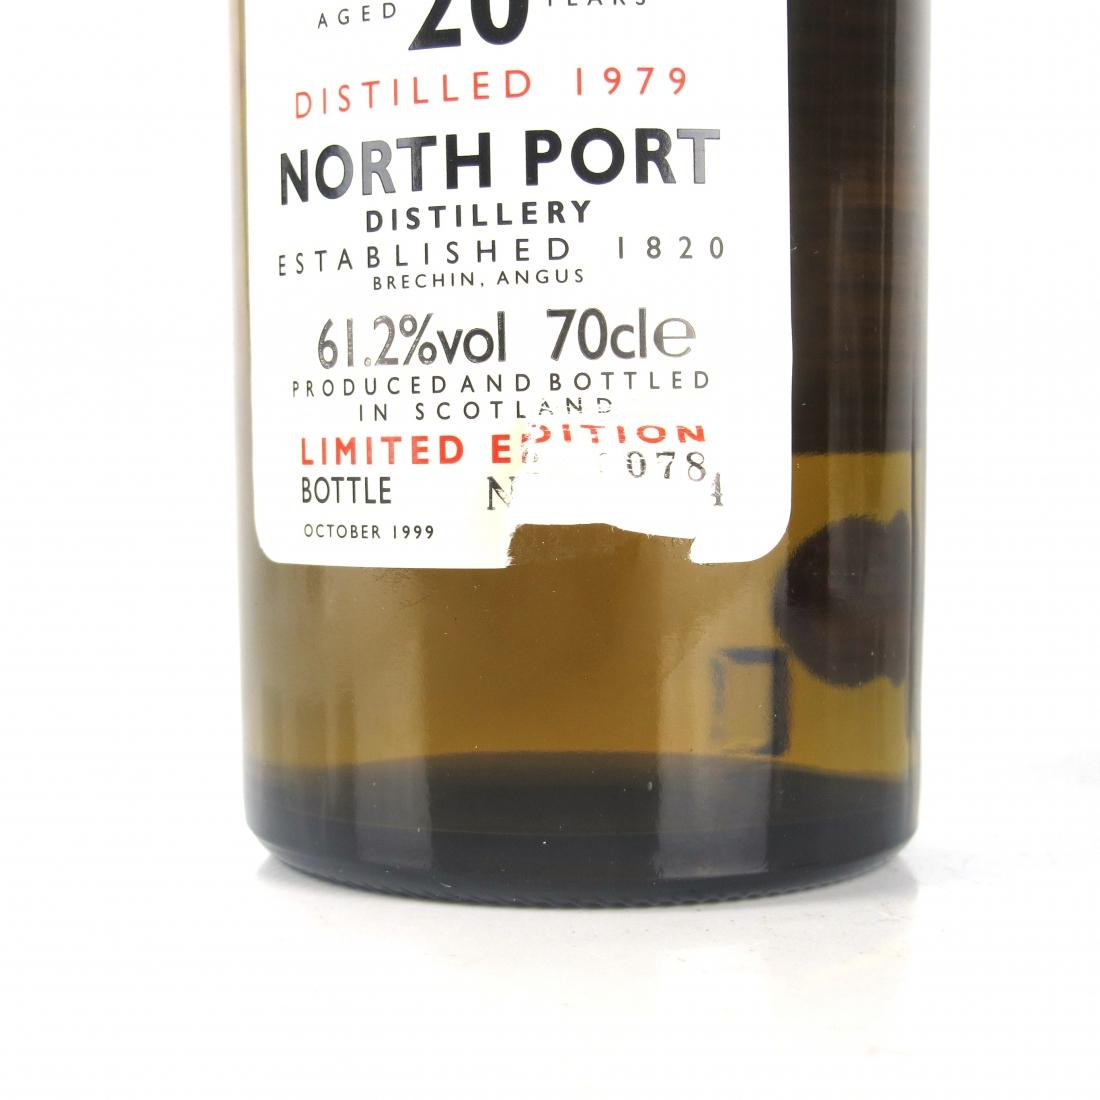 North Port 1979 Rare Malt 20 Year Old / 61.2%